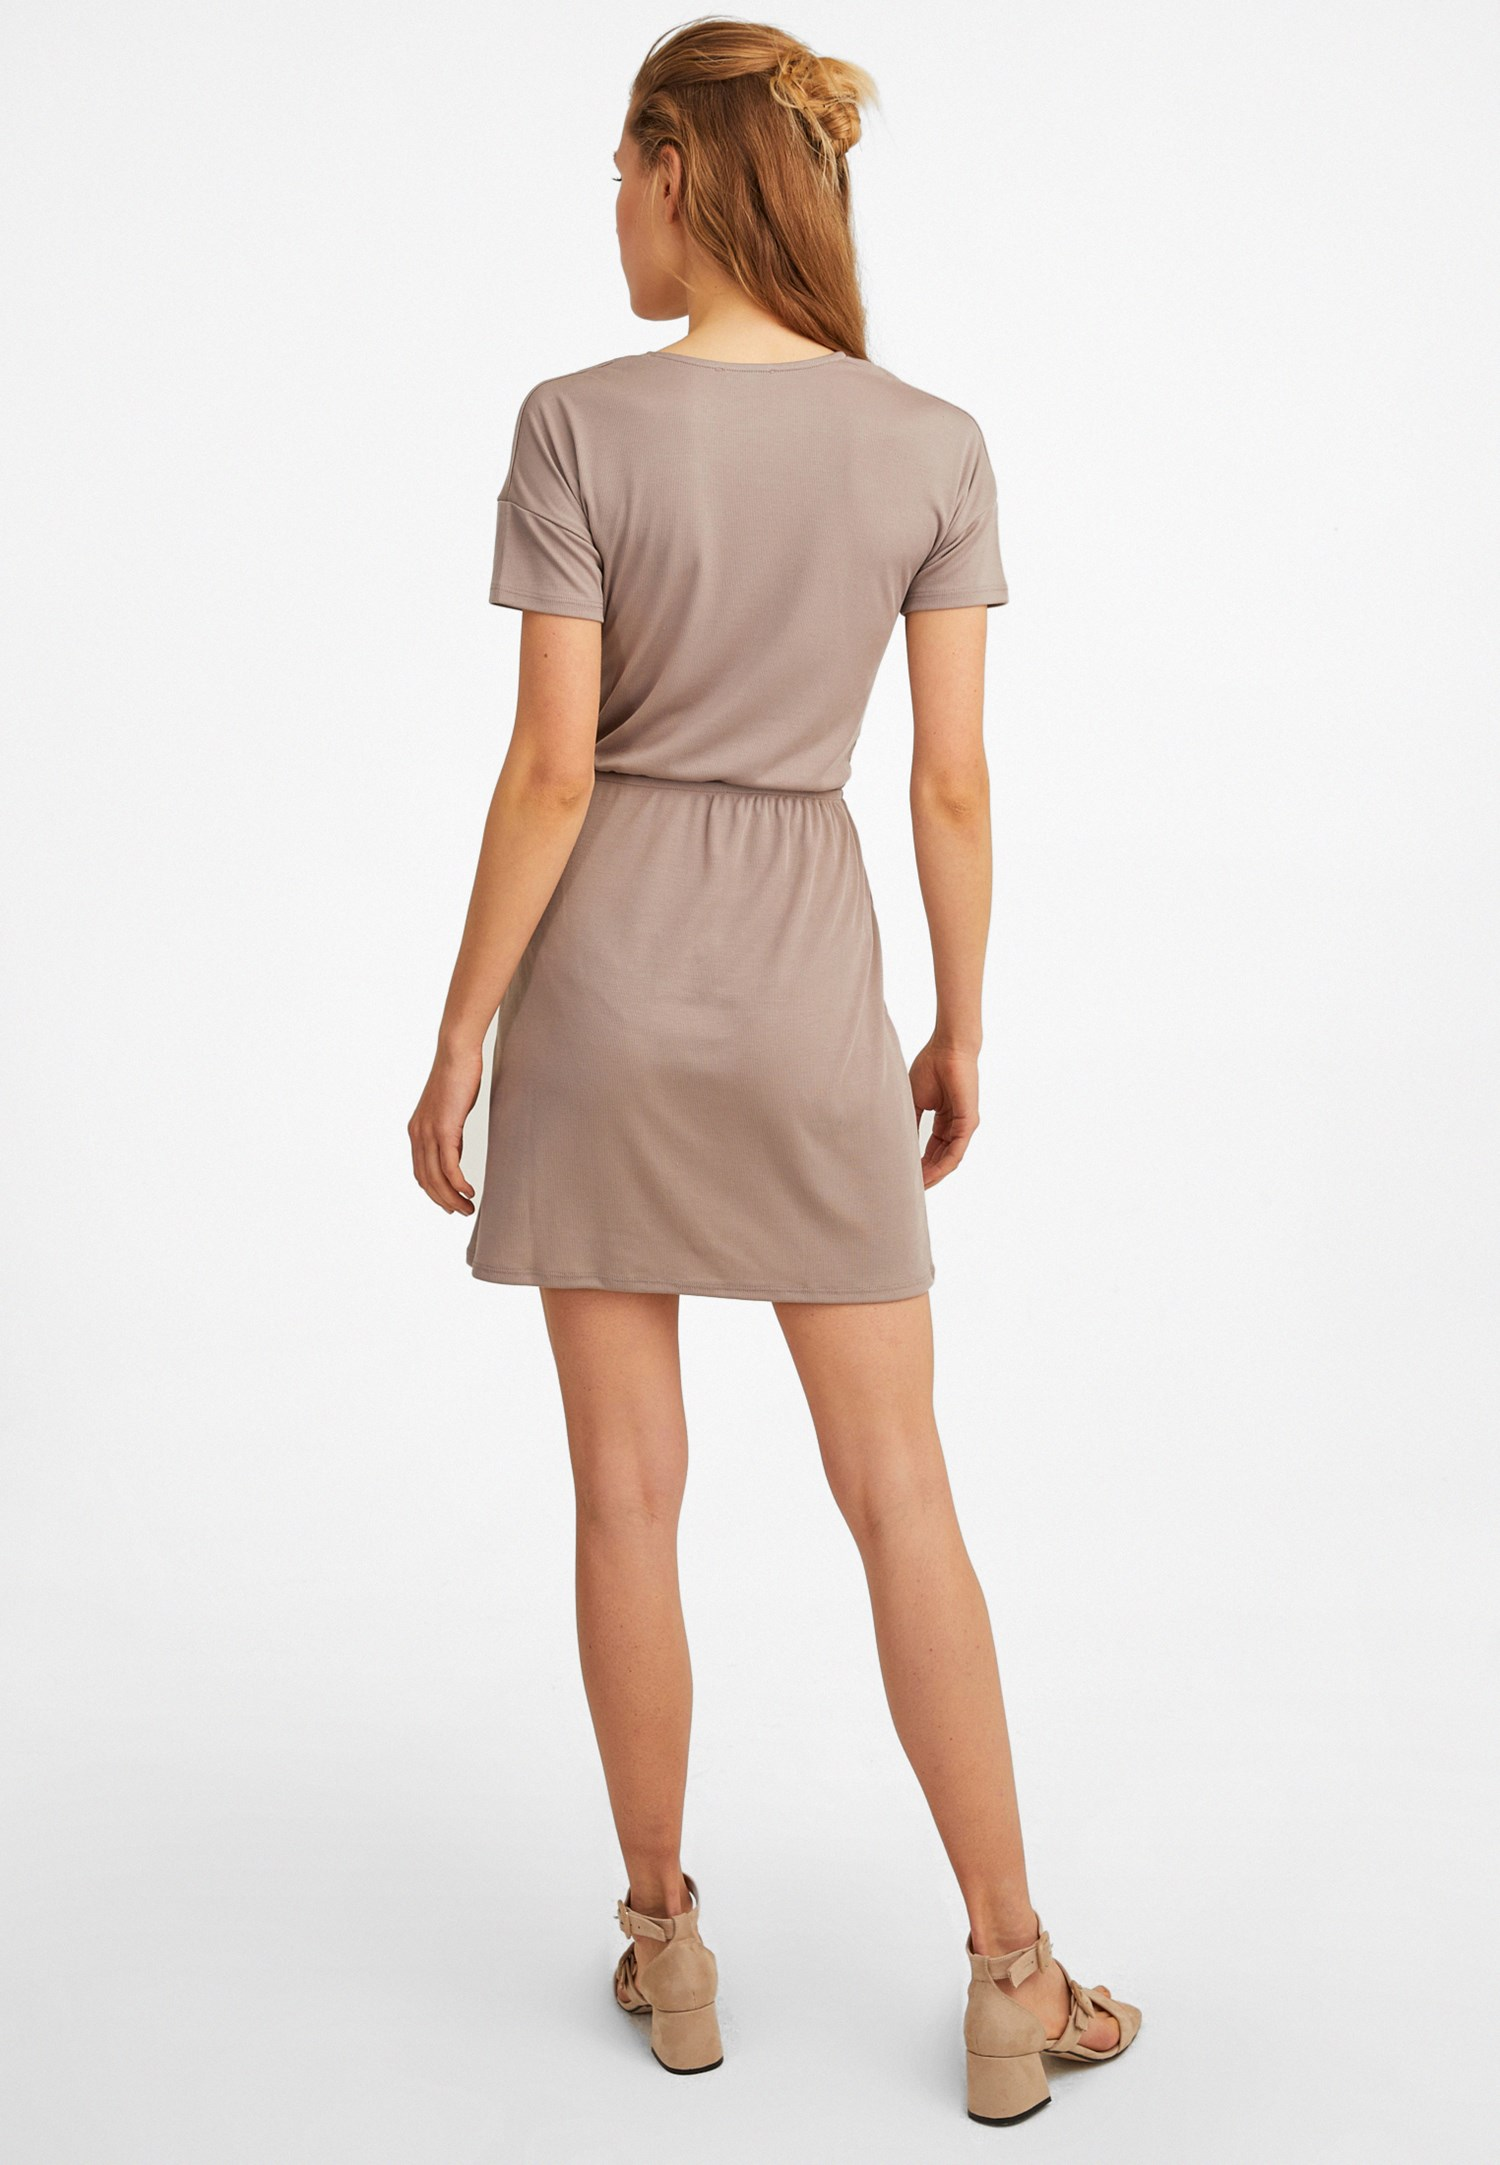 Bayan Kahverengi Yumuşak Dokulu Midi Elbise